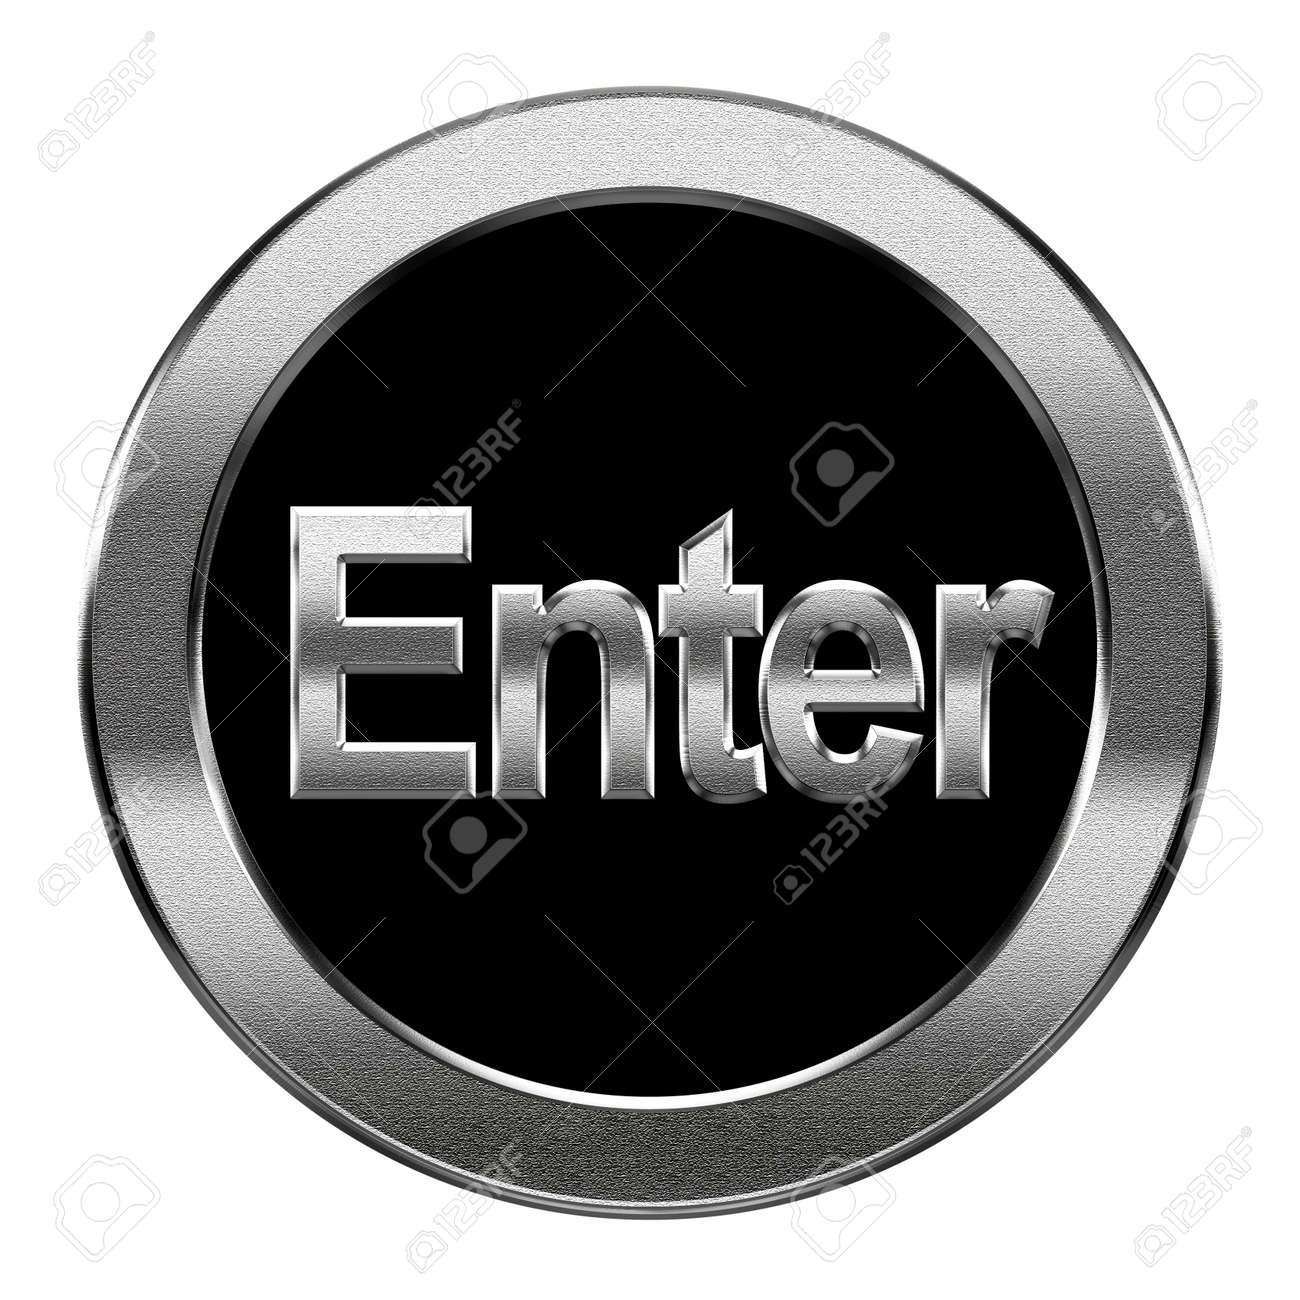 Enter icon silver, isolated on white background Stock Photo - 16334929